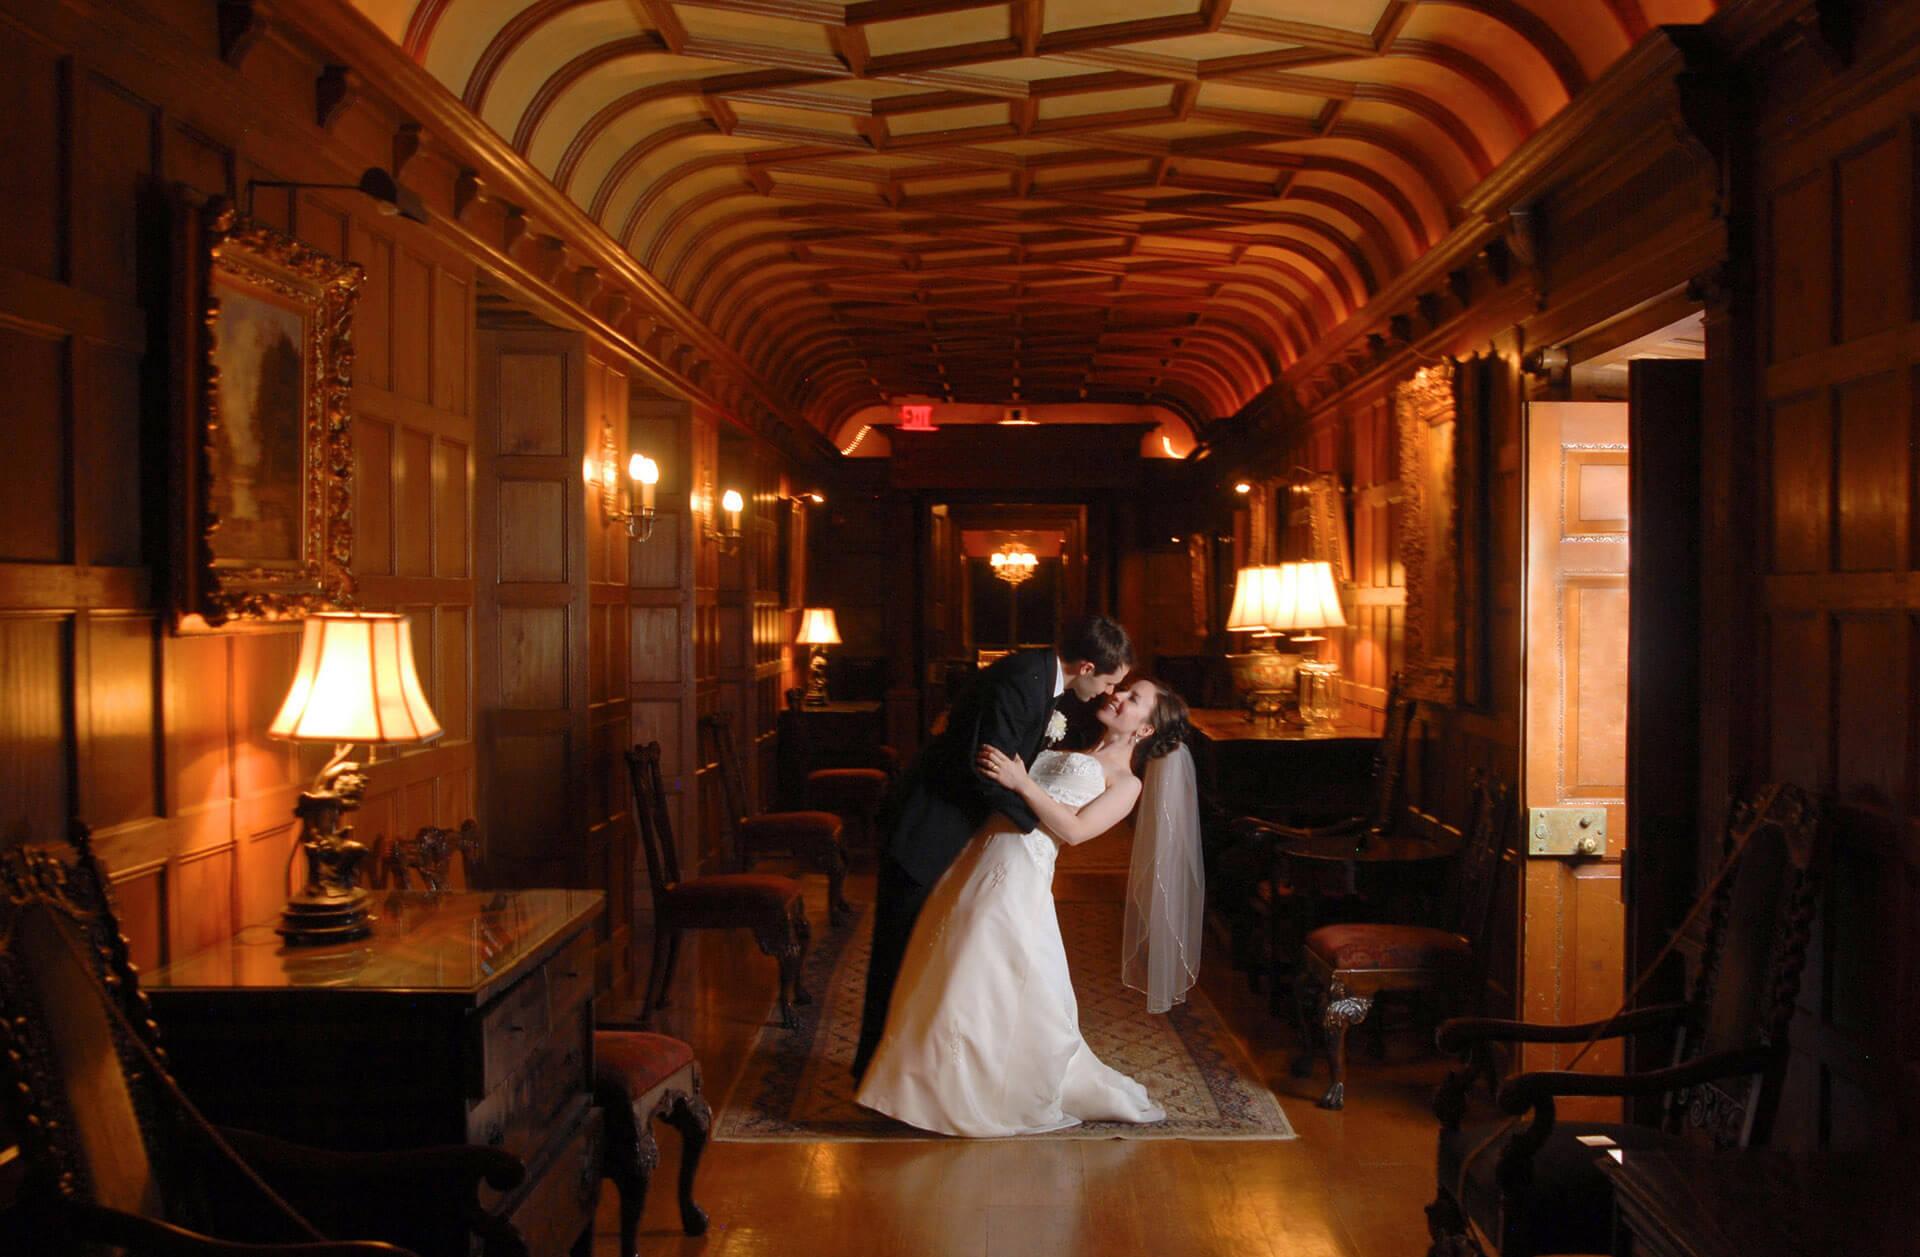 michigan wedding photographer shoot a couple at Meadowbrook hall during a wedding.